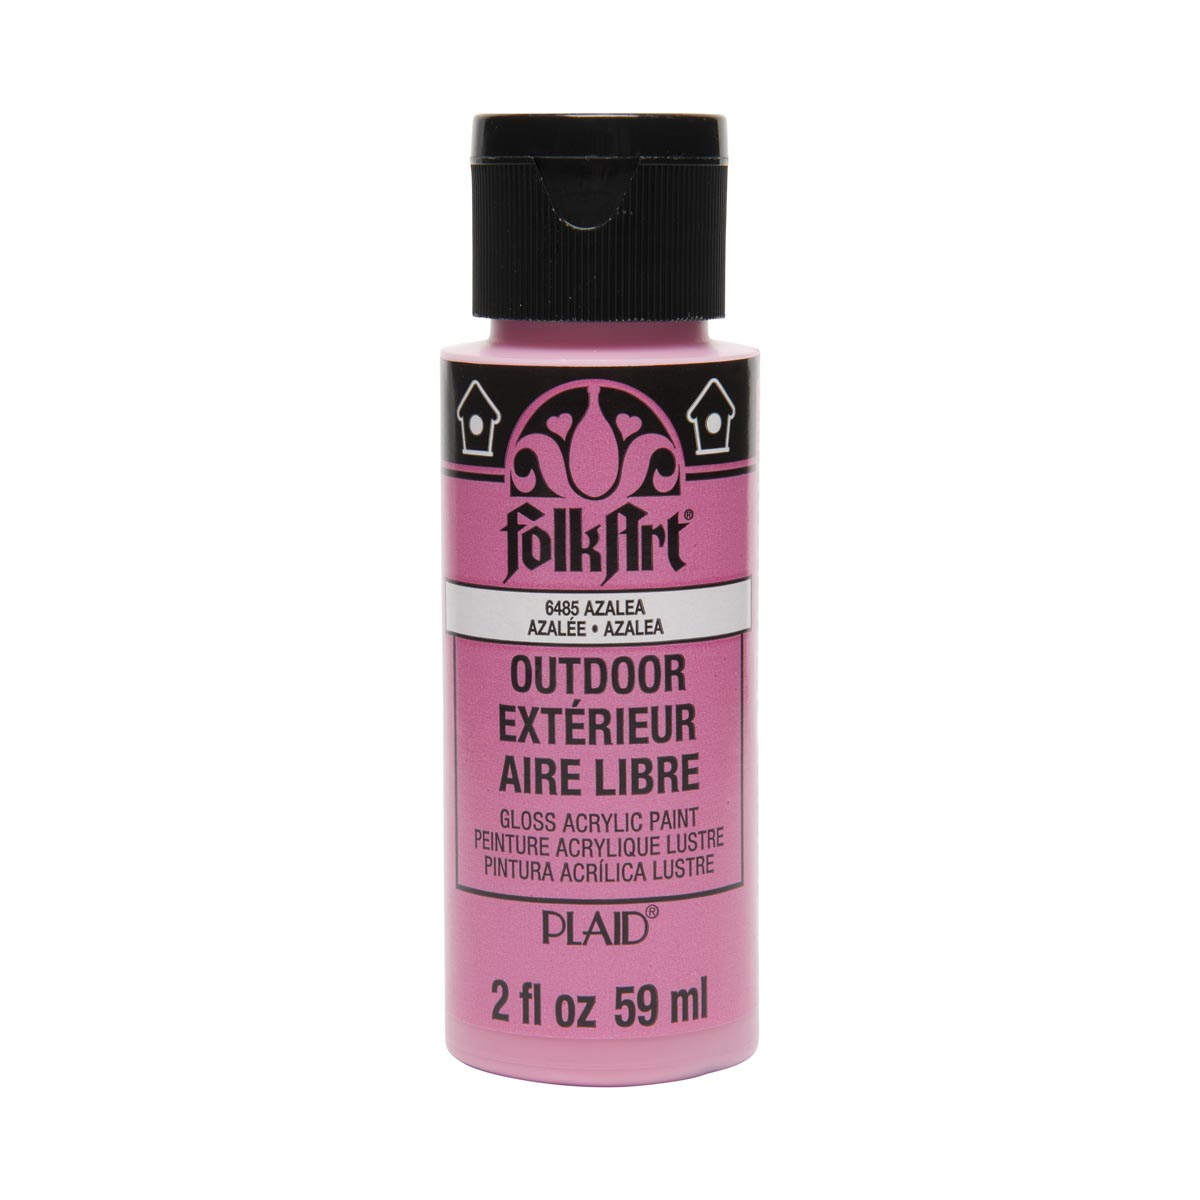 FolkArt ® Outdoor™ Acrylic Colors - Azalea, 2 oz. - 6485